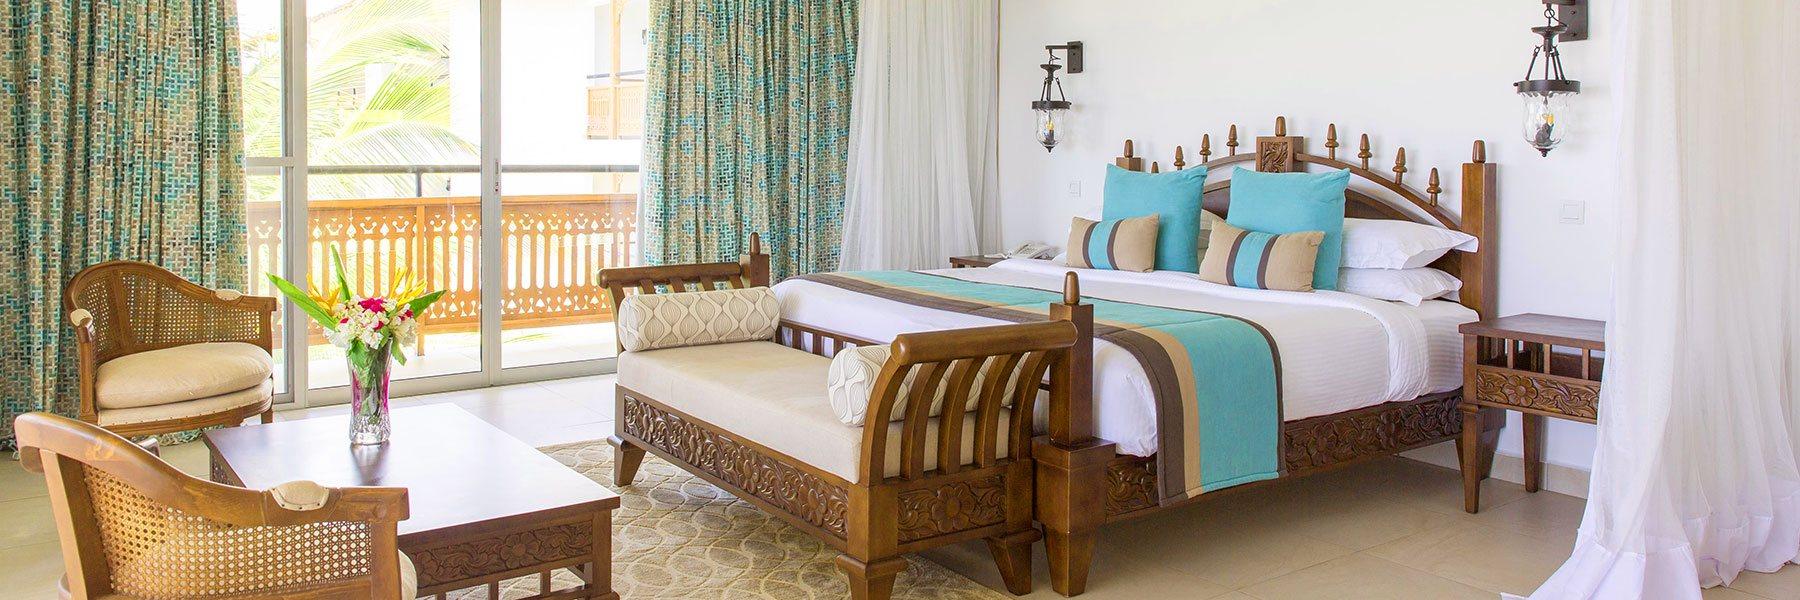 Zanzibar Accommodations